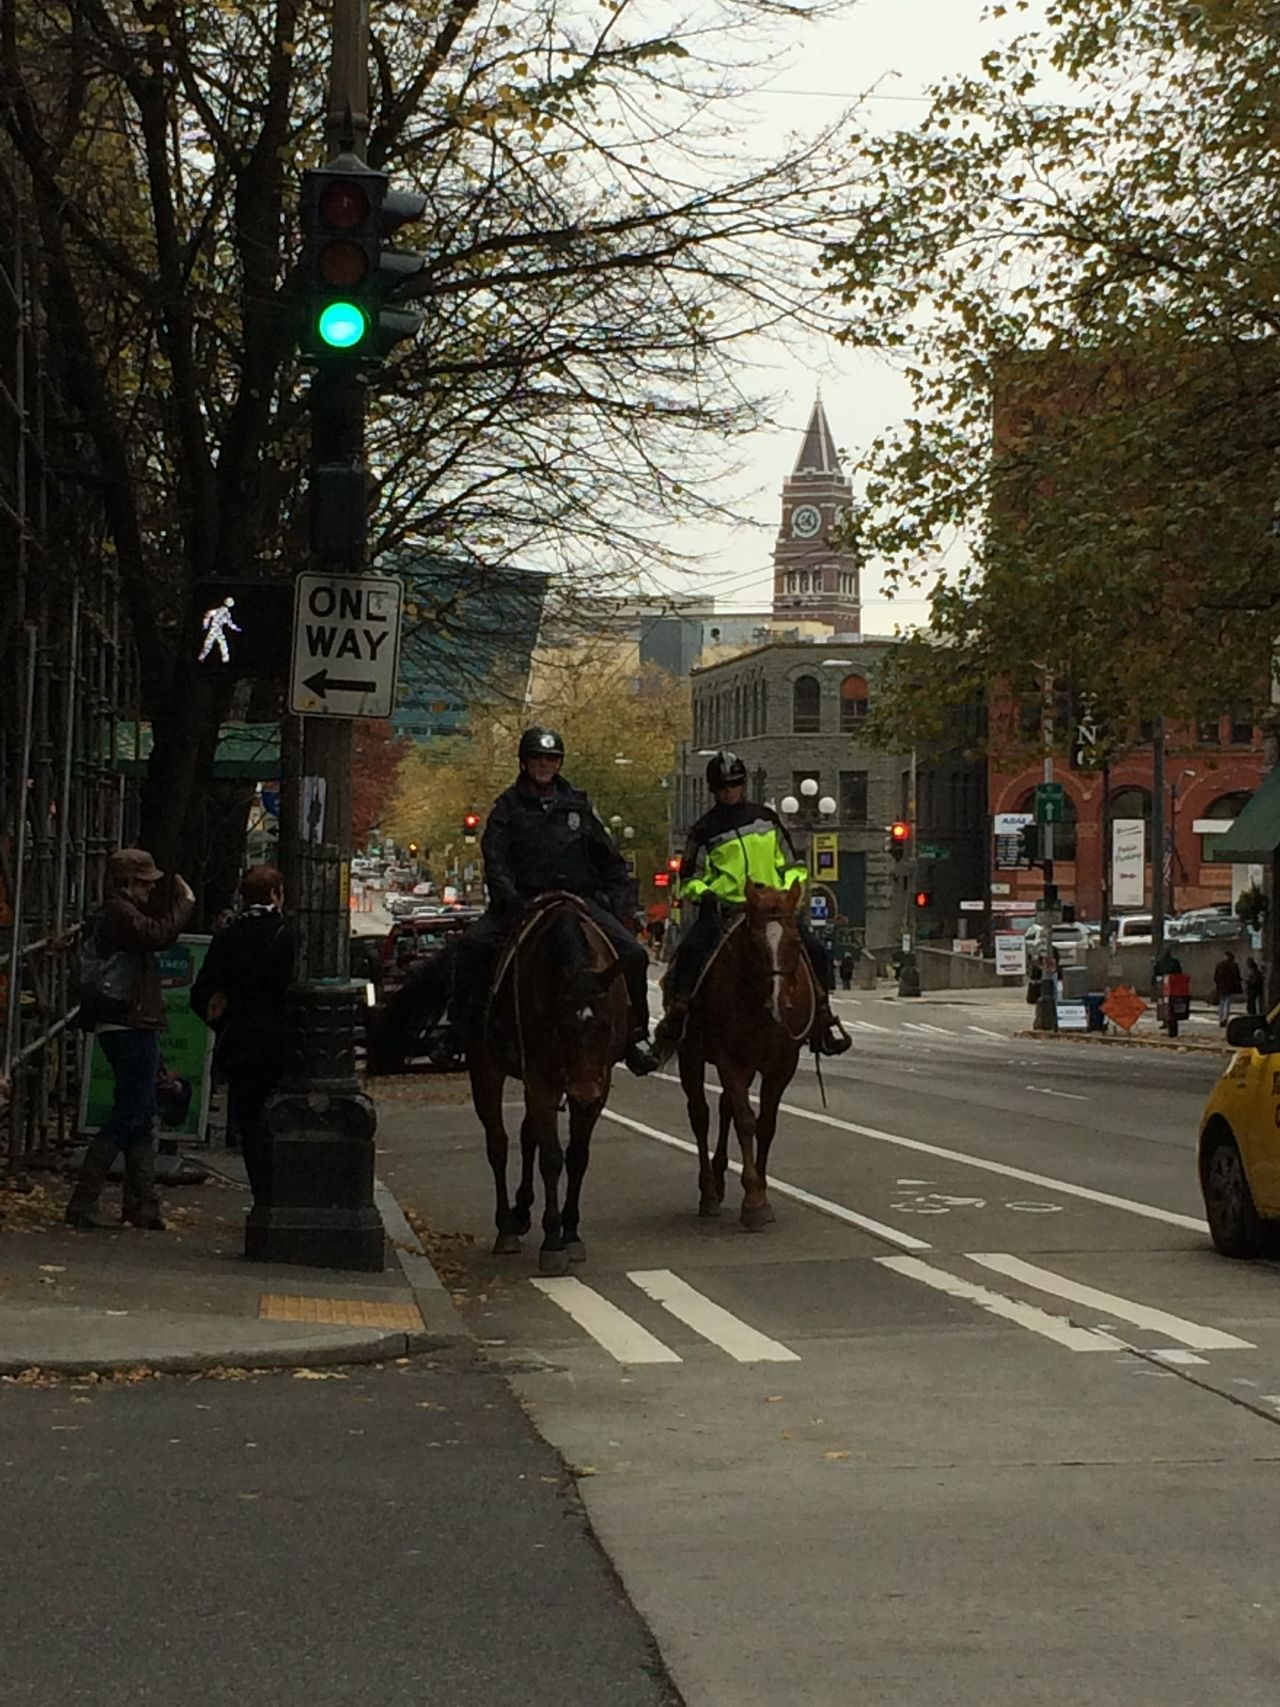 OneYearAgo Seattle USA Horsepolice Oneway